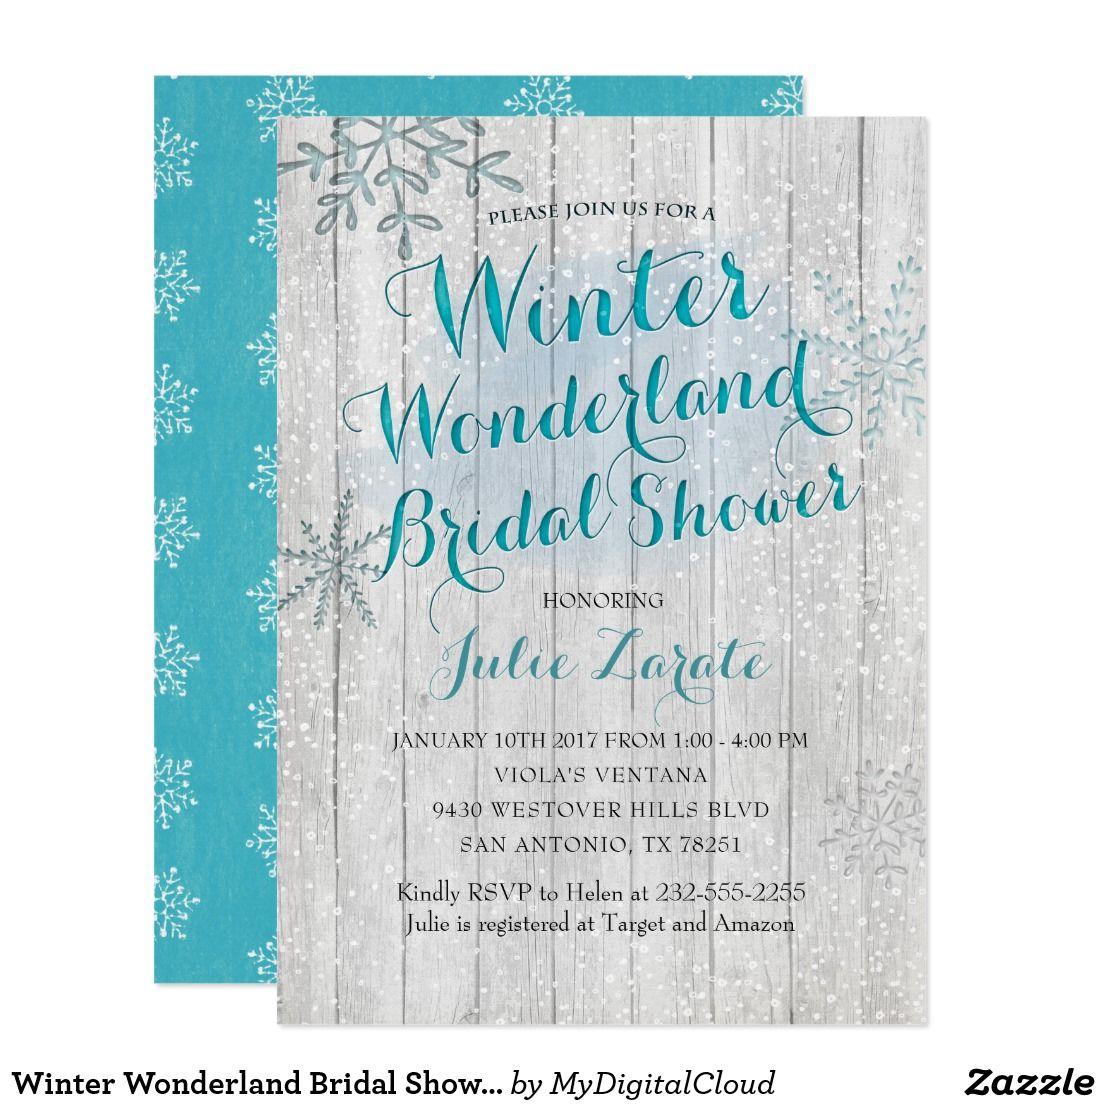 Winter Wonderland Invitations Bridal Shower | www.topsimages.com